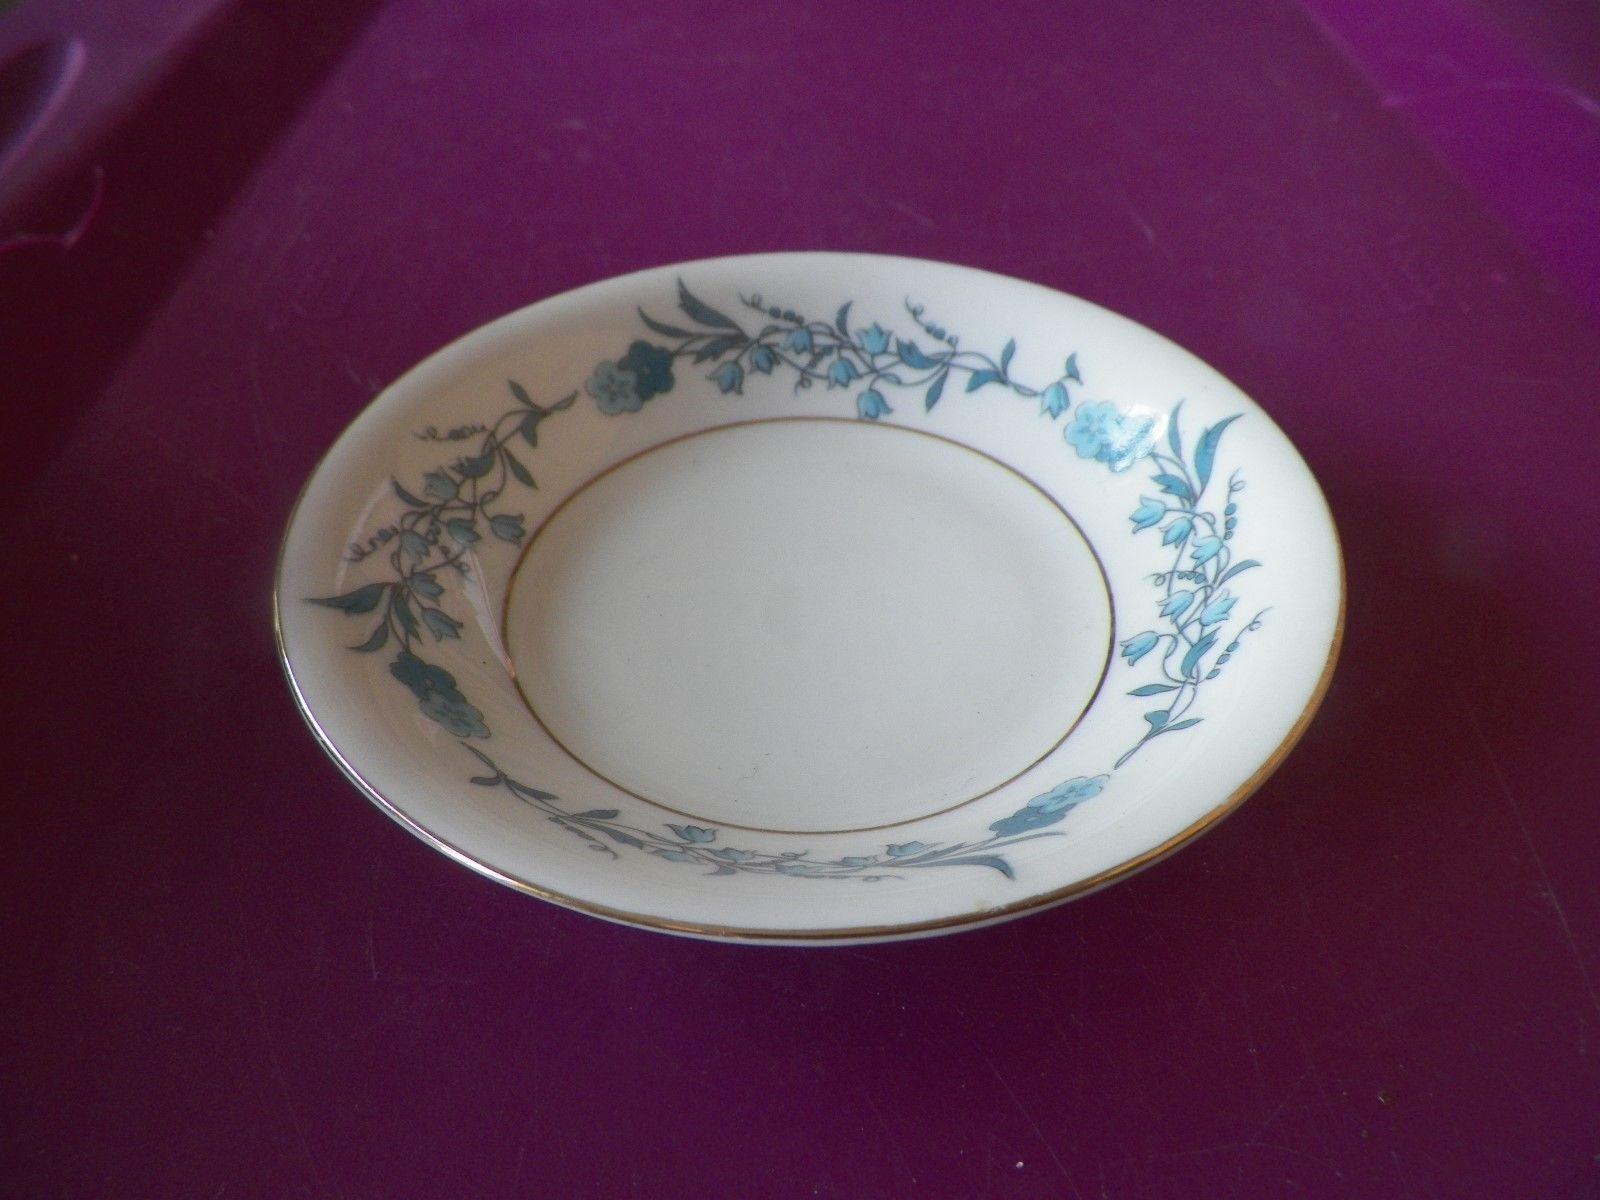 Theodore Haviland fruit bowl (Clinton) 1 available - $4.11